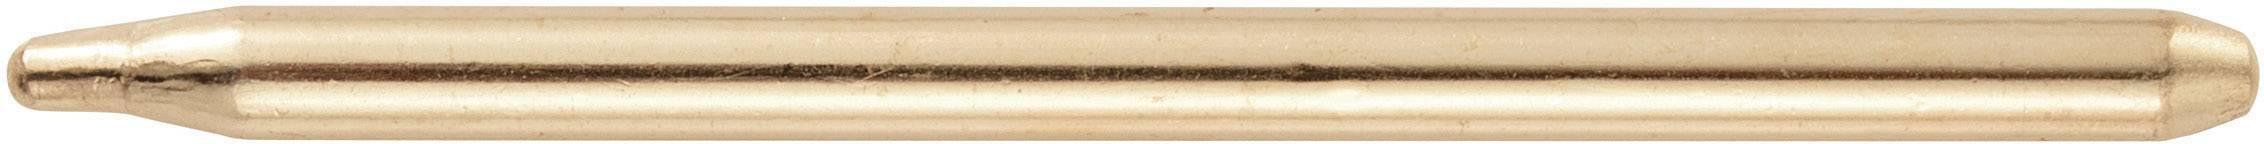 Teplovodivá trubka Sinter-Heatpipe Gelid CP-S6100-01, 35 W